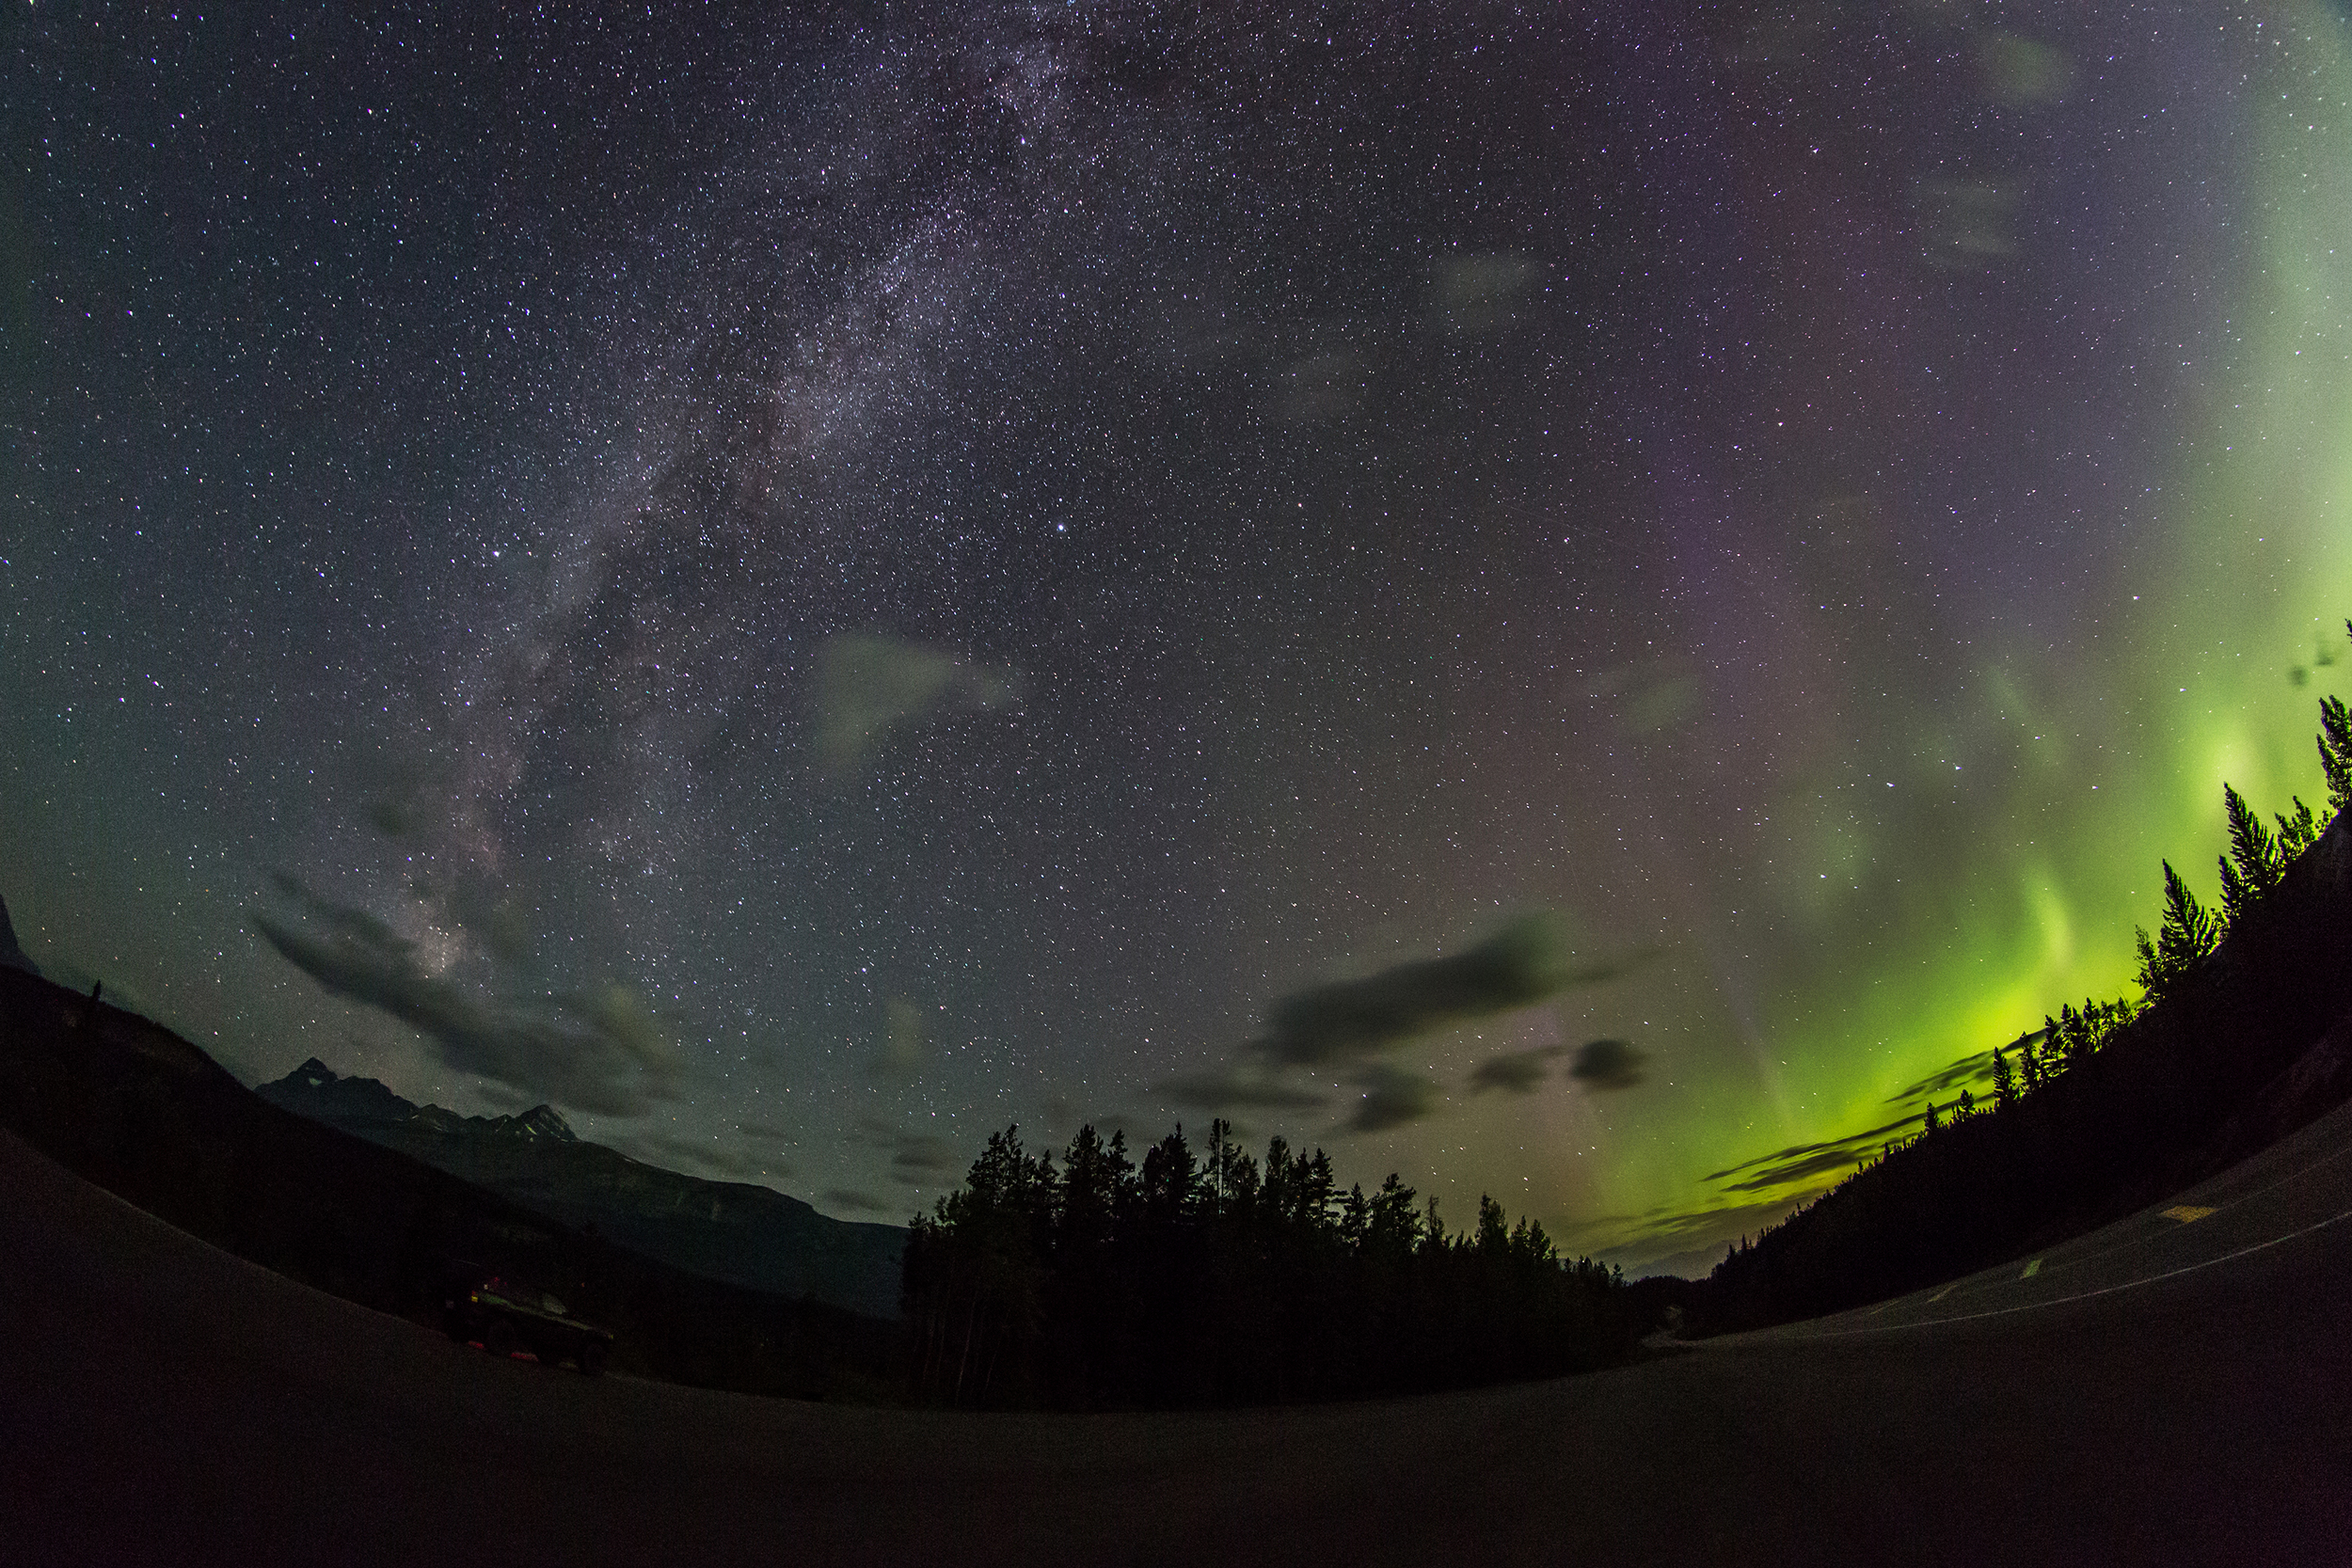 Milky Way vs. Auroras